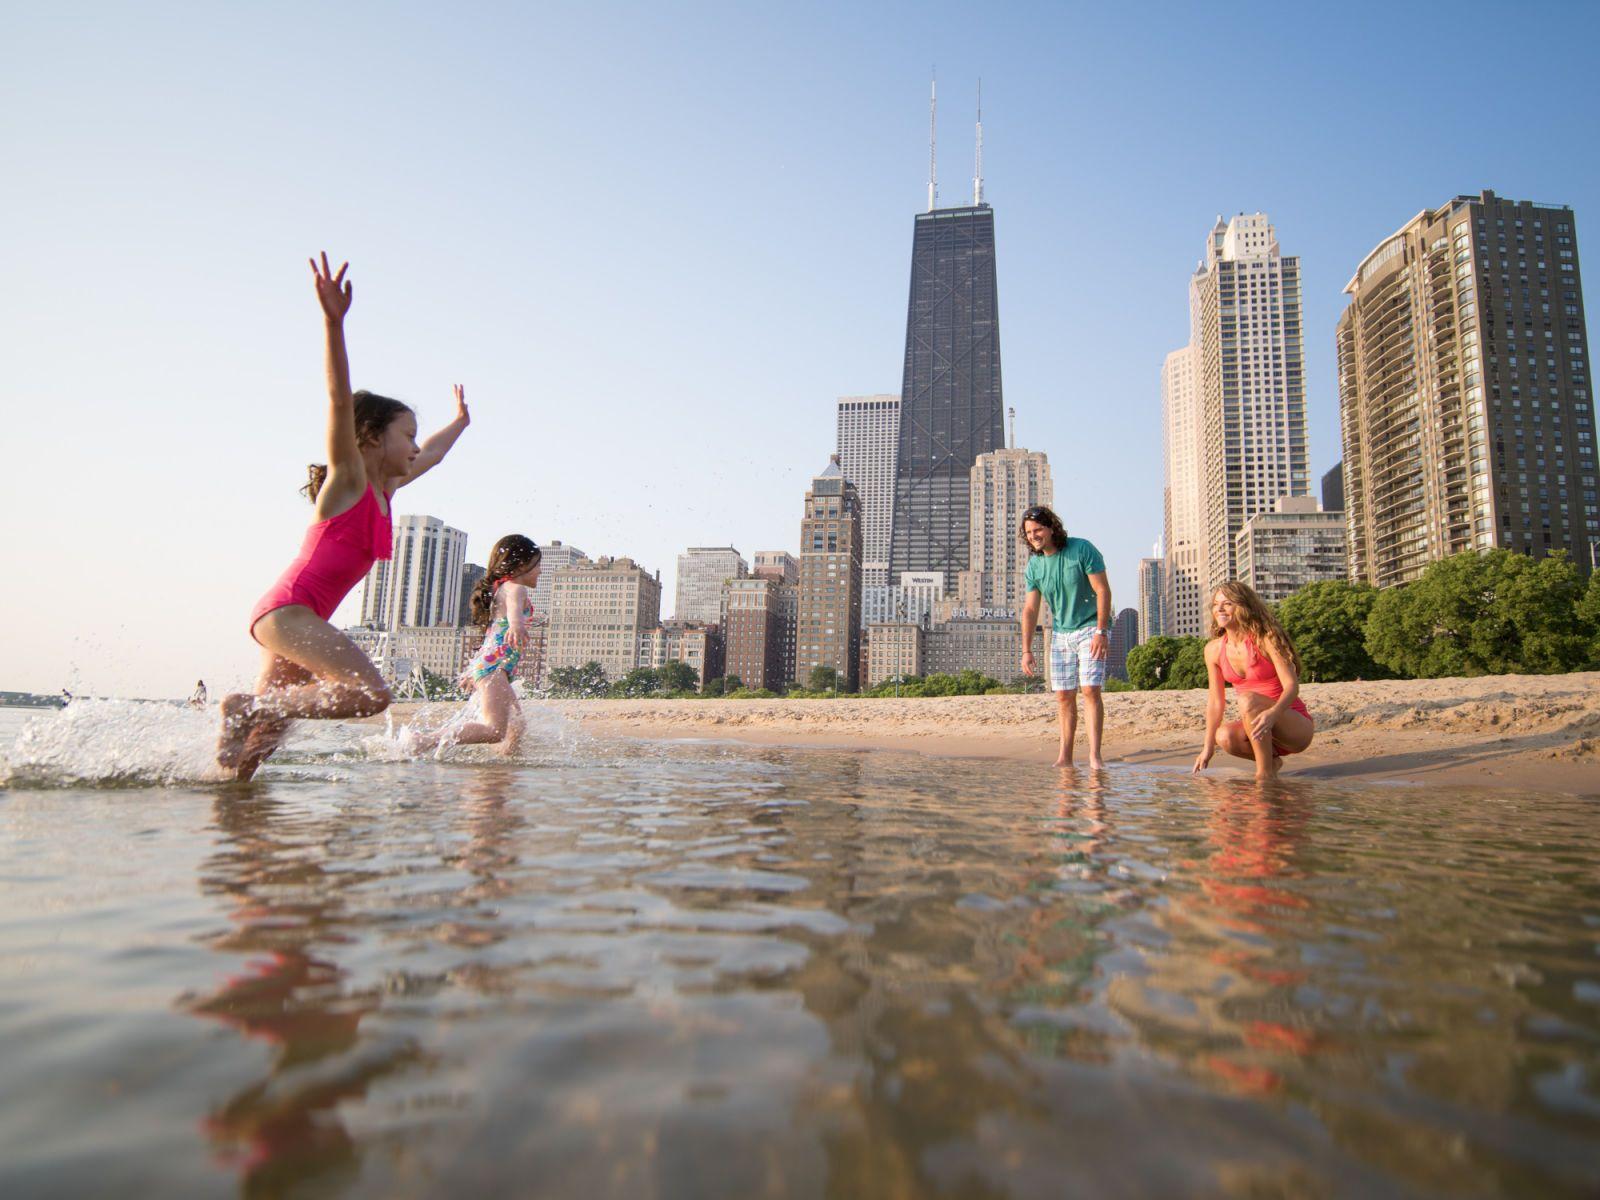 Illinois Board of Tourism